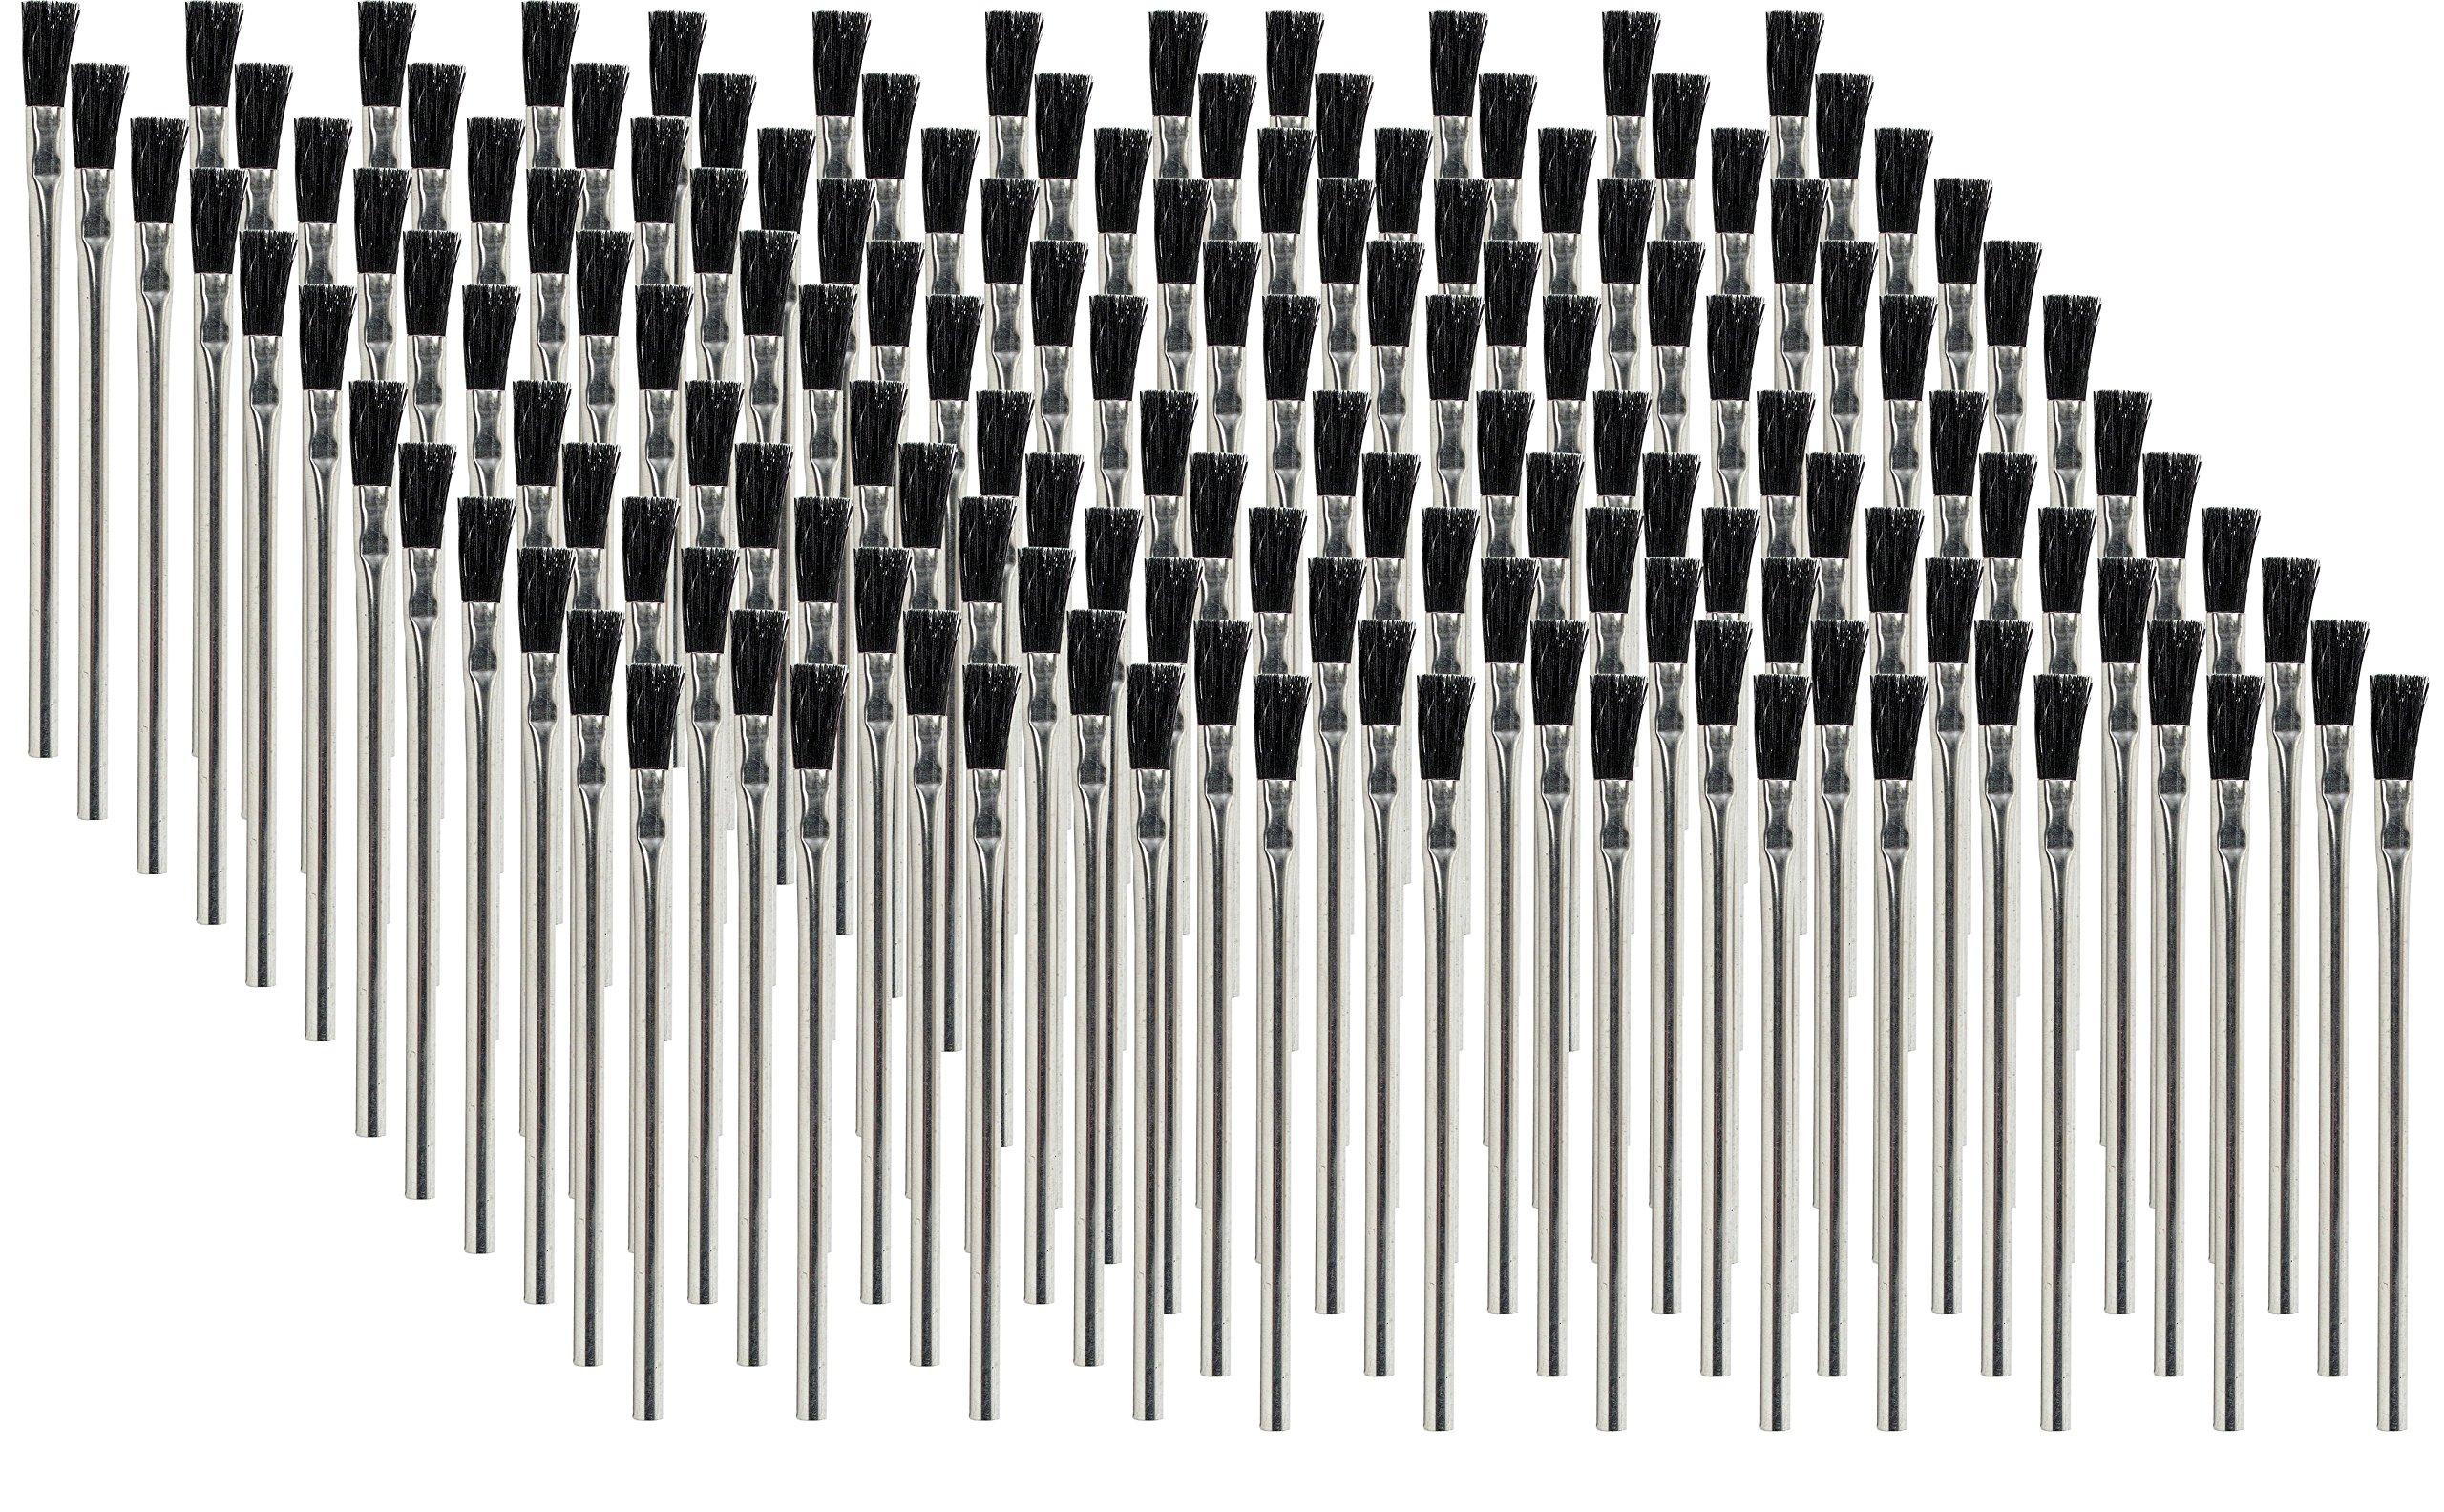 144 Pack Alfa Tools AB74061 6-1//8 x 7//16 Acid Brush